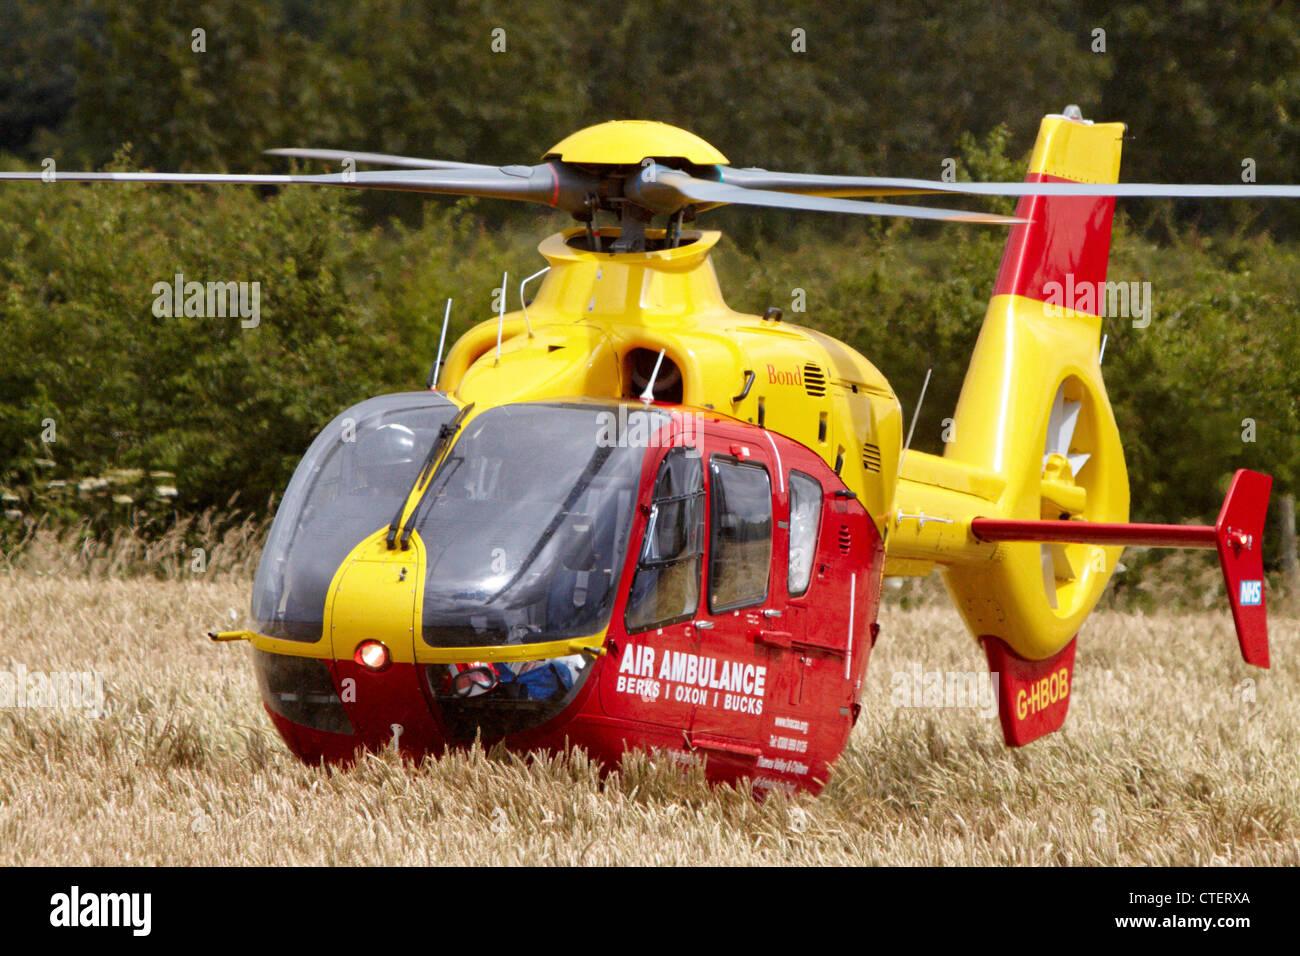 Berks Oxon Bucks Air Ambulance Helicopter G-HBOB - Stock Image